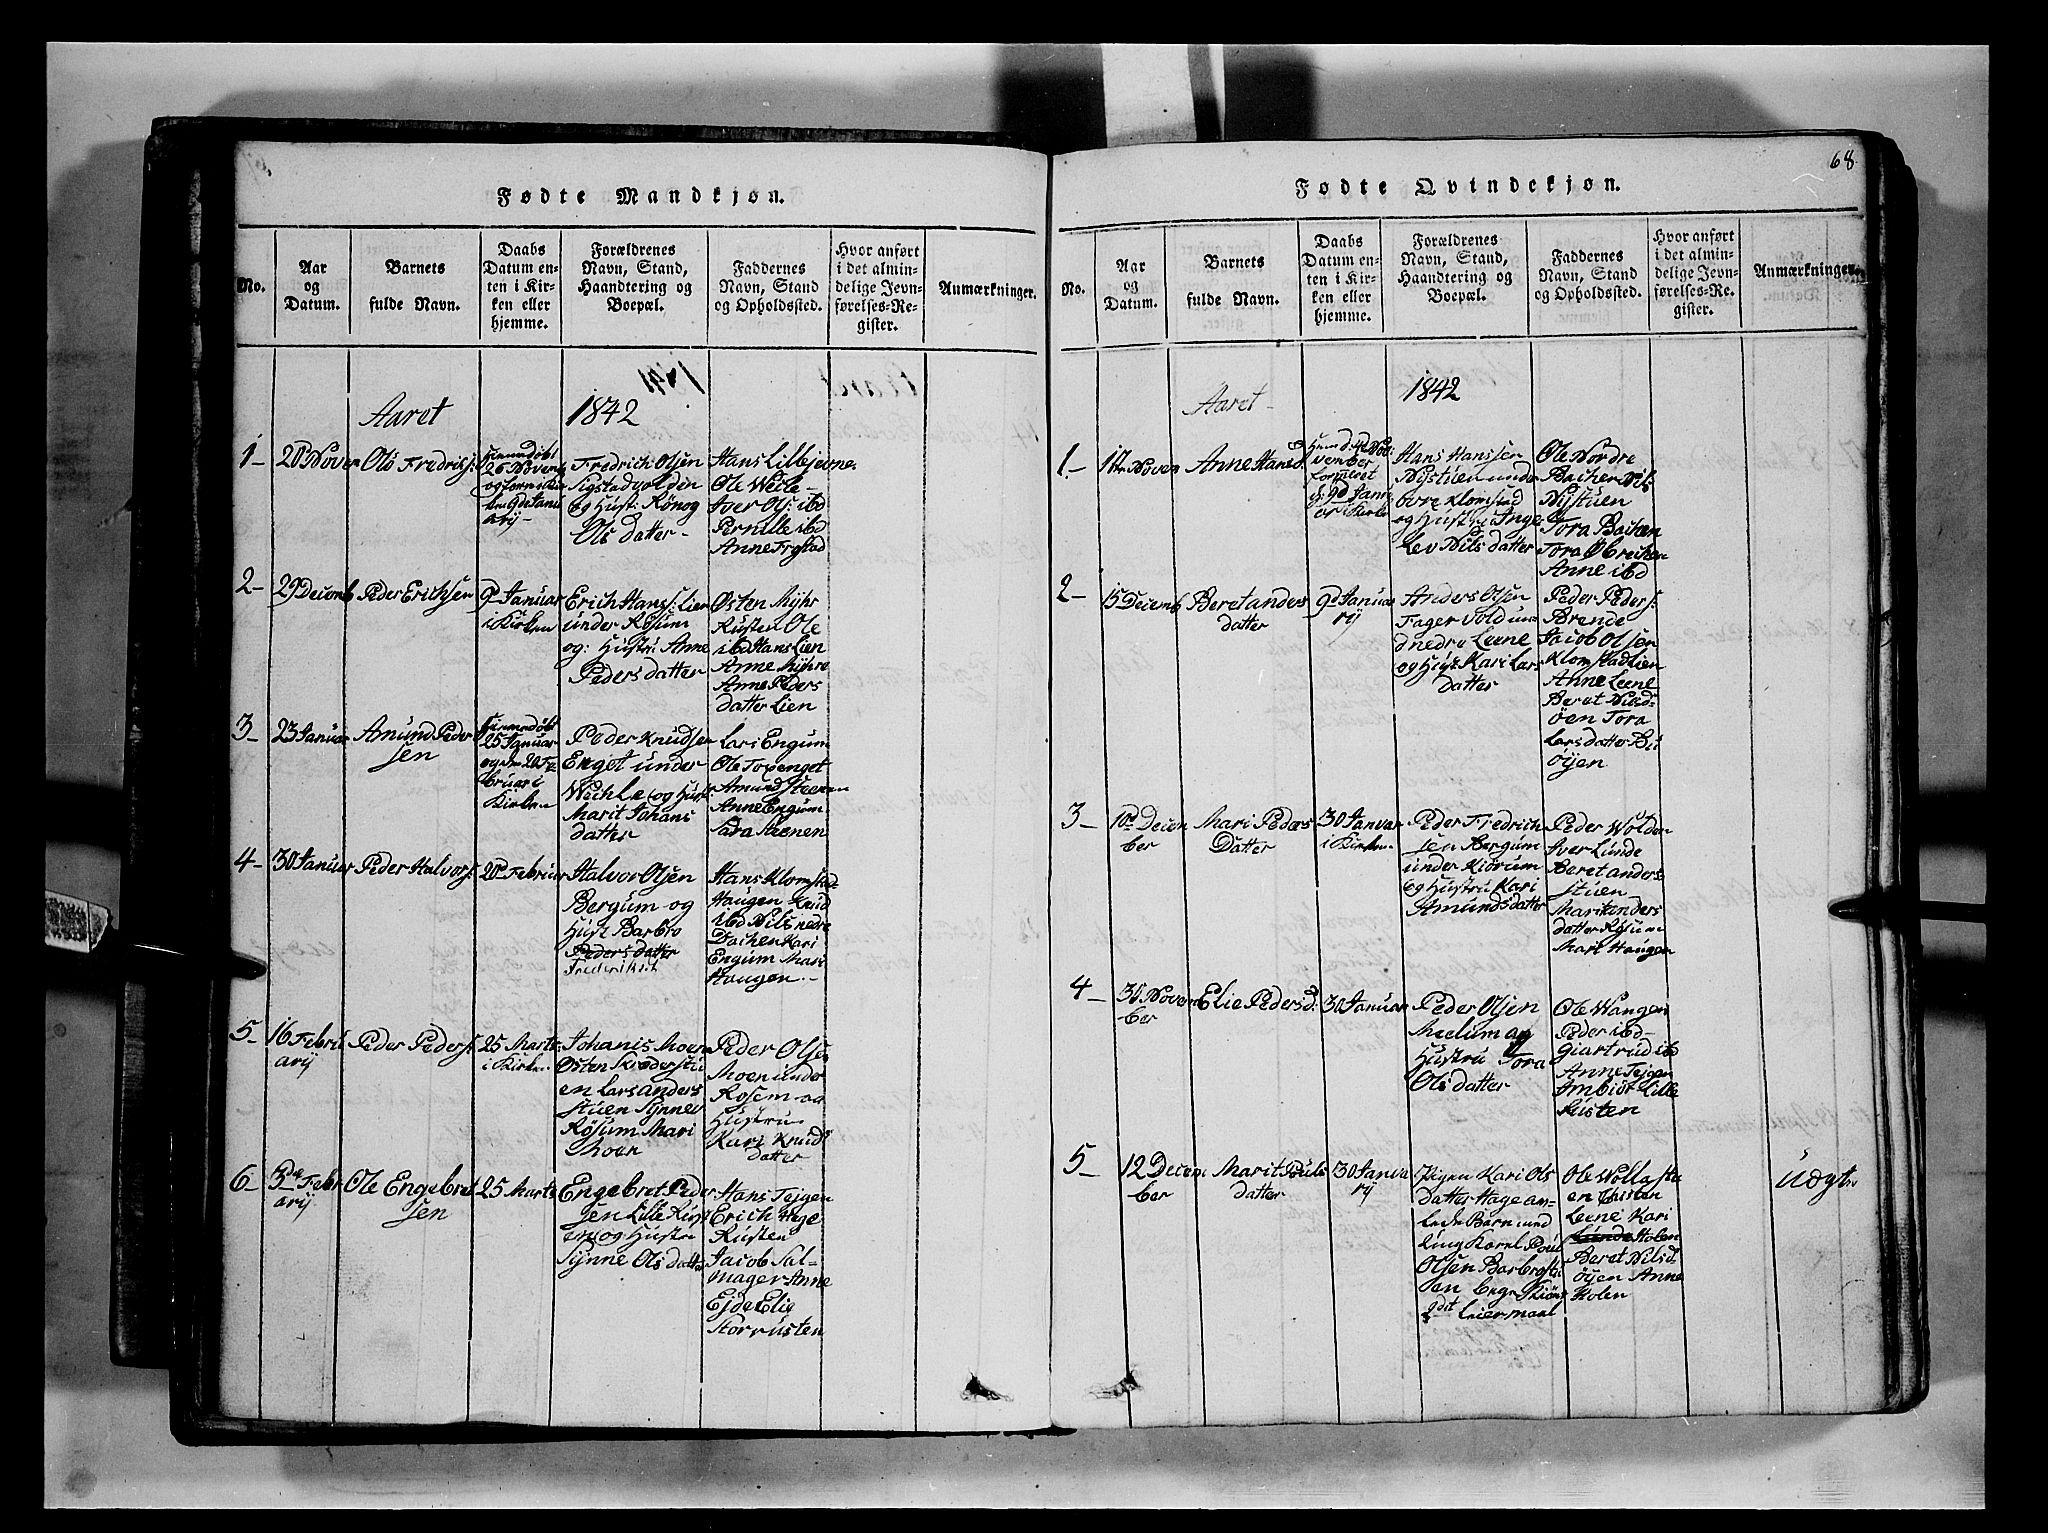 SAH, Fron prestekontor, H/Ha/Hab/L0002: Klokkerbok nr. 2, 1816-1850, s. 68